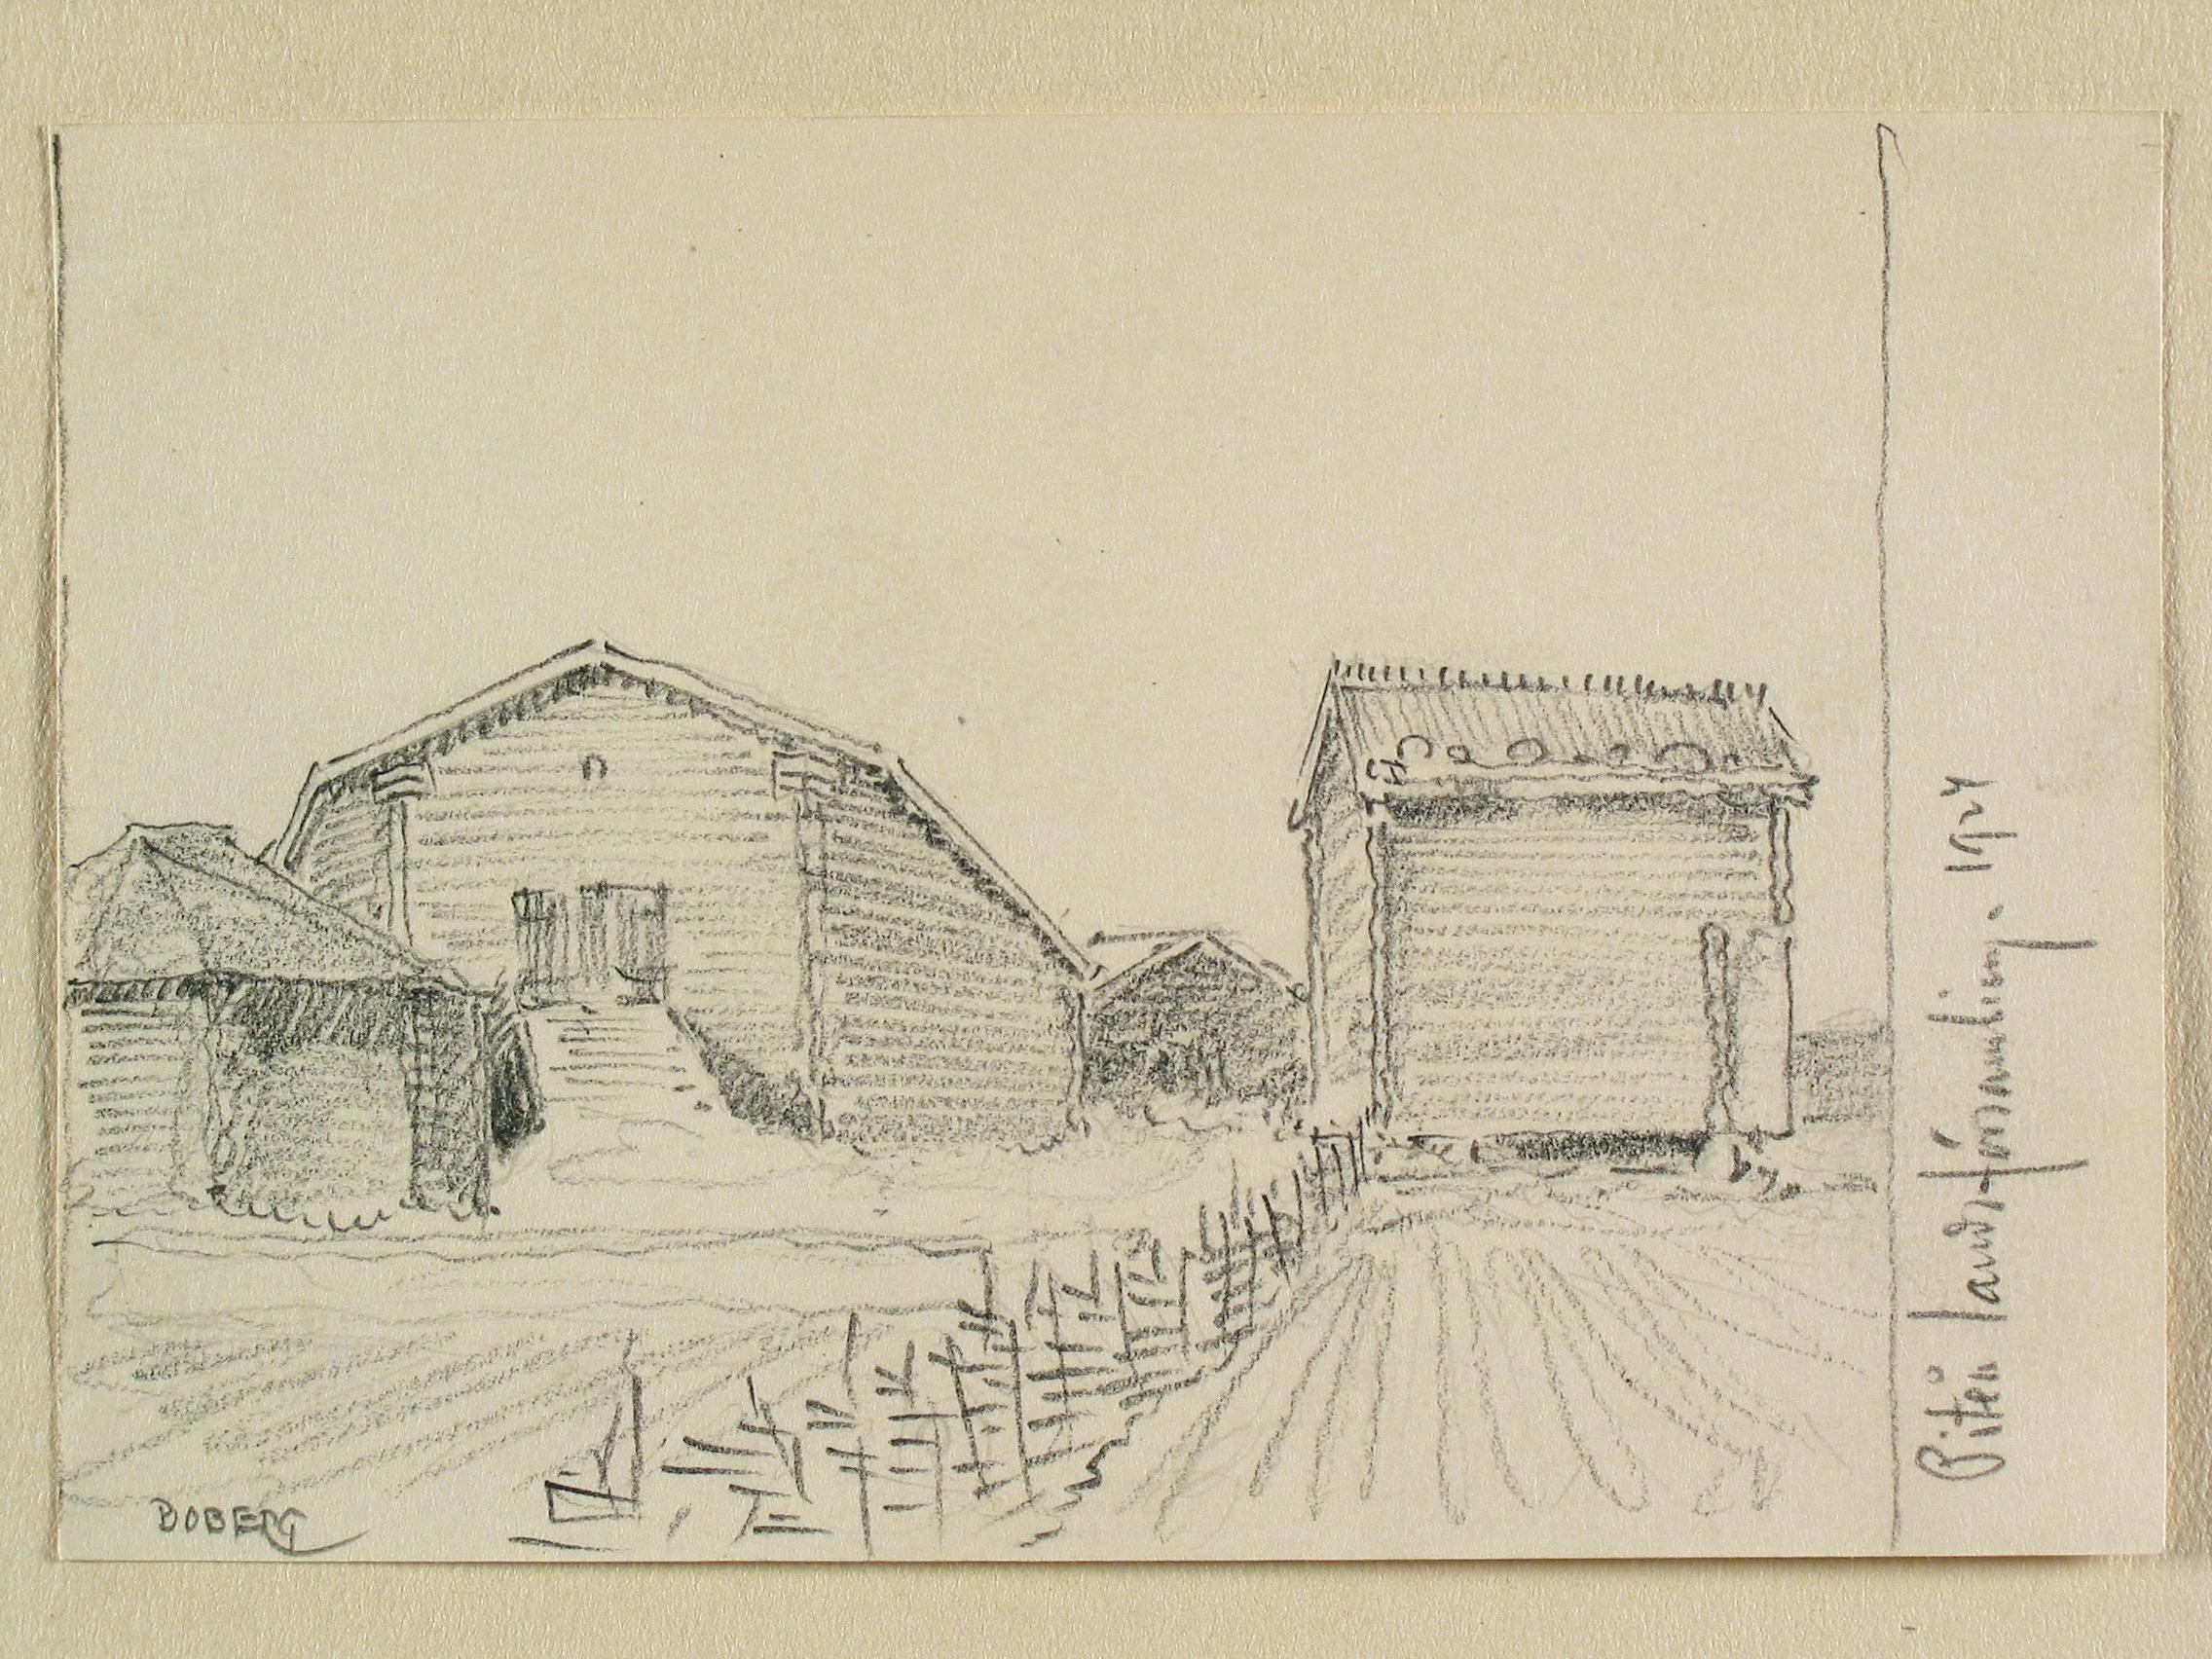 File:Norrbotten, Pite landsfrs., Lillpite. Grdsbrunn